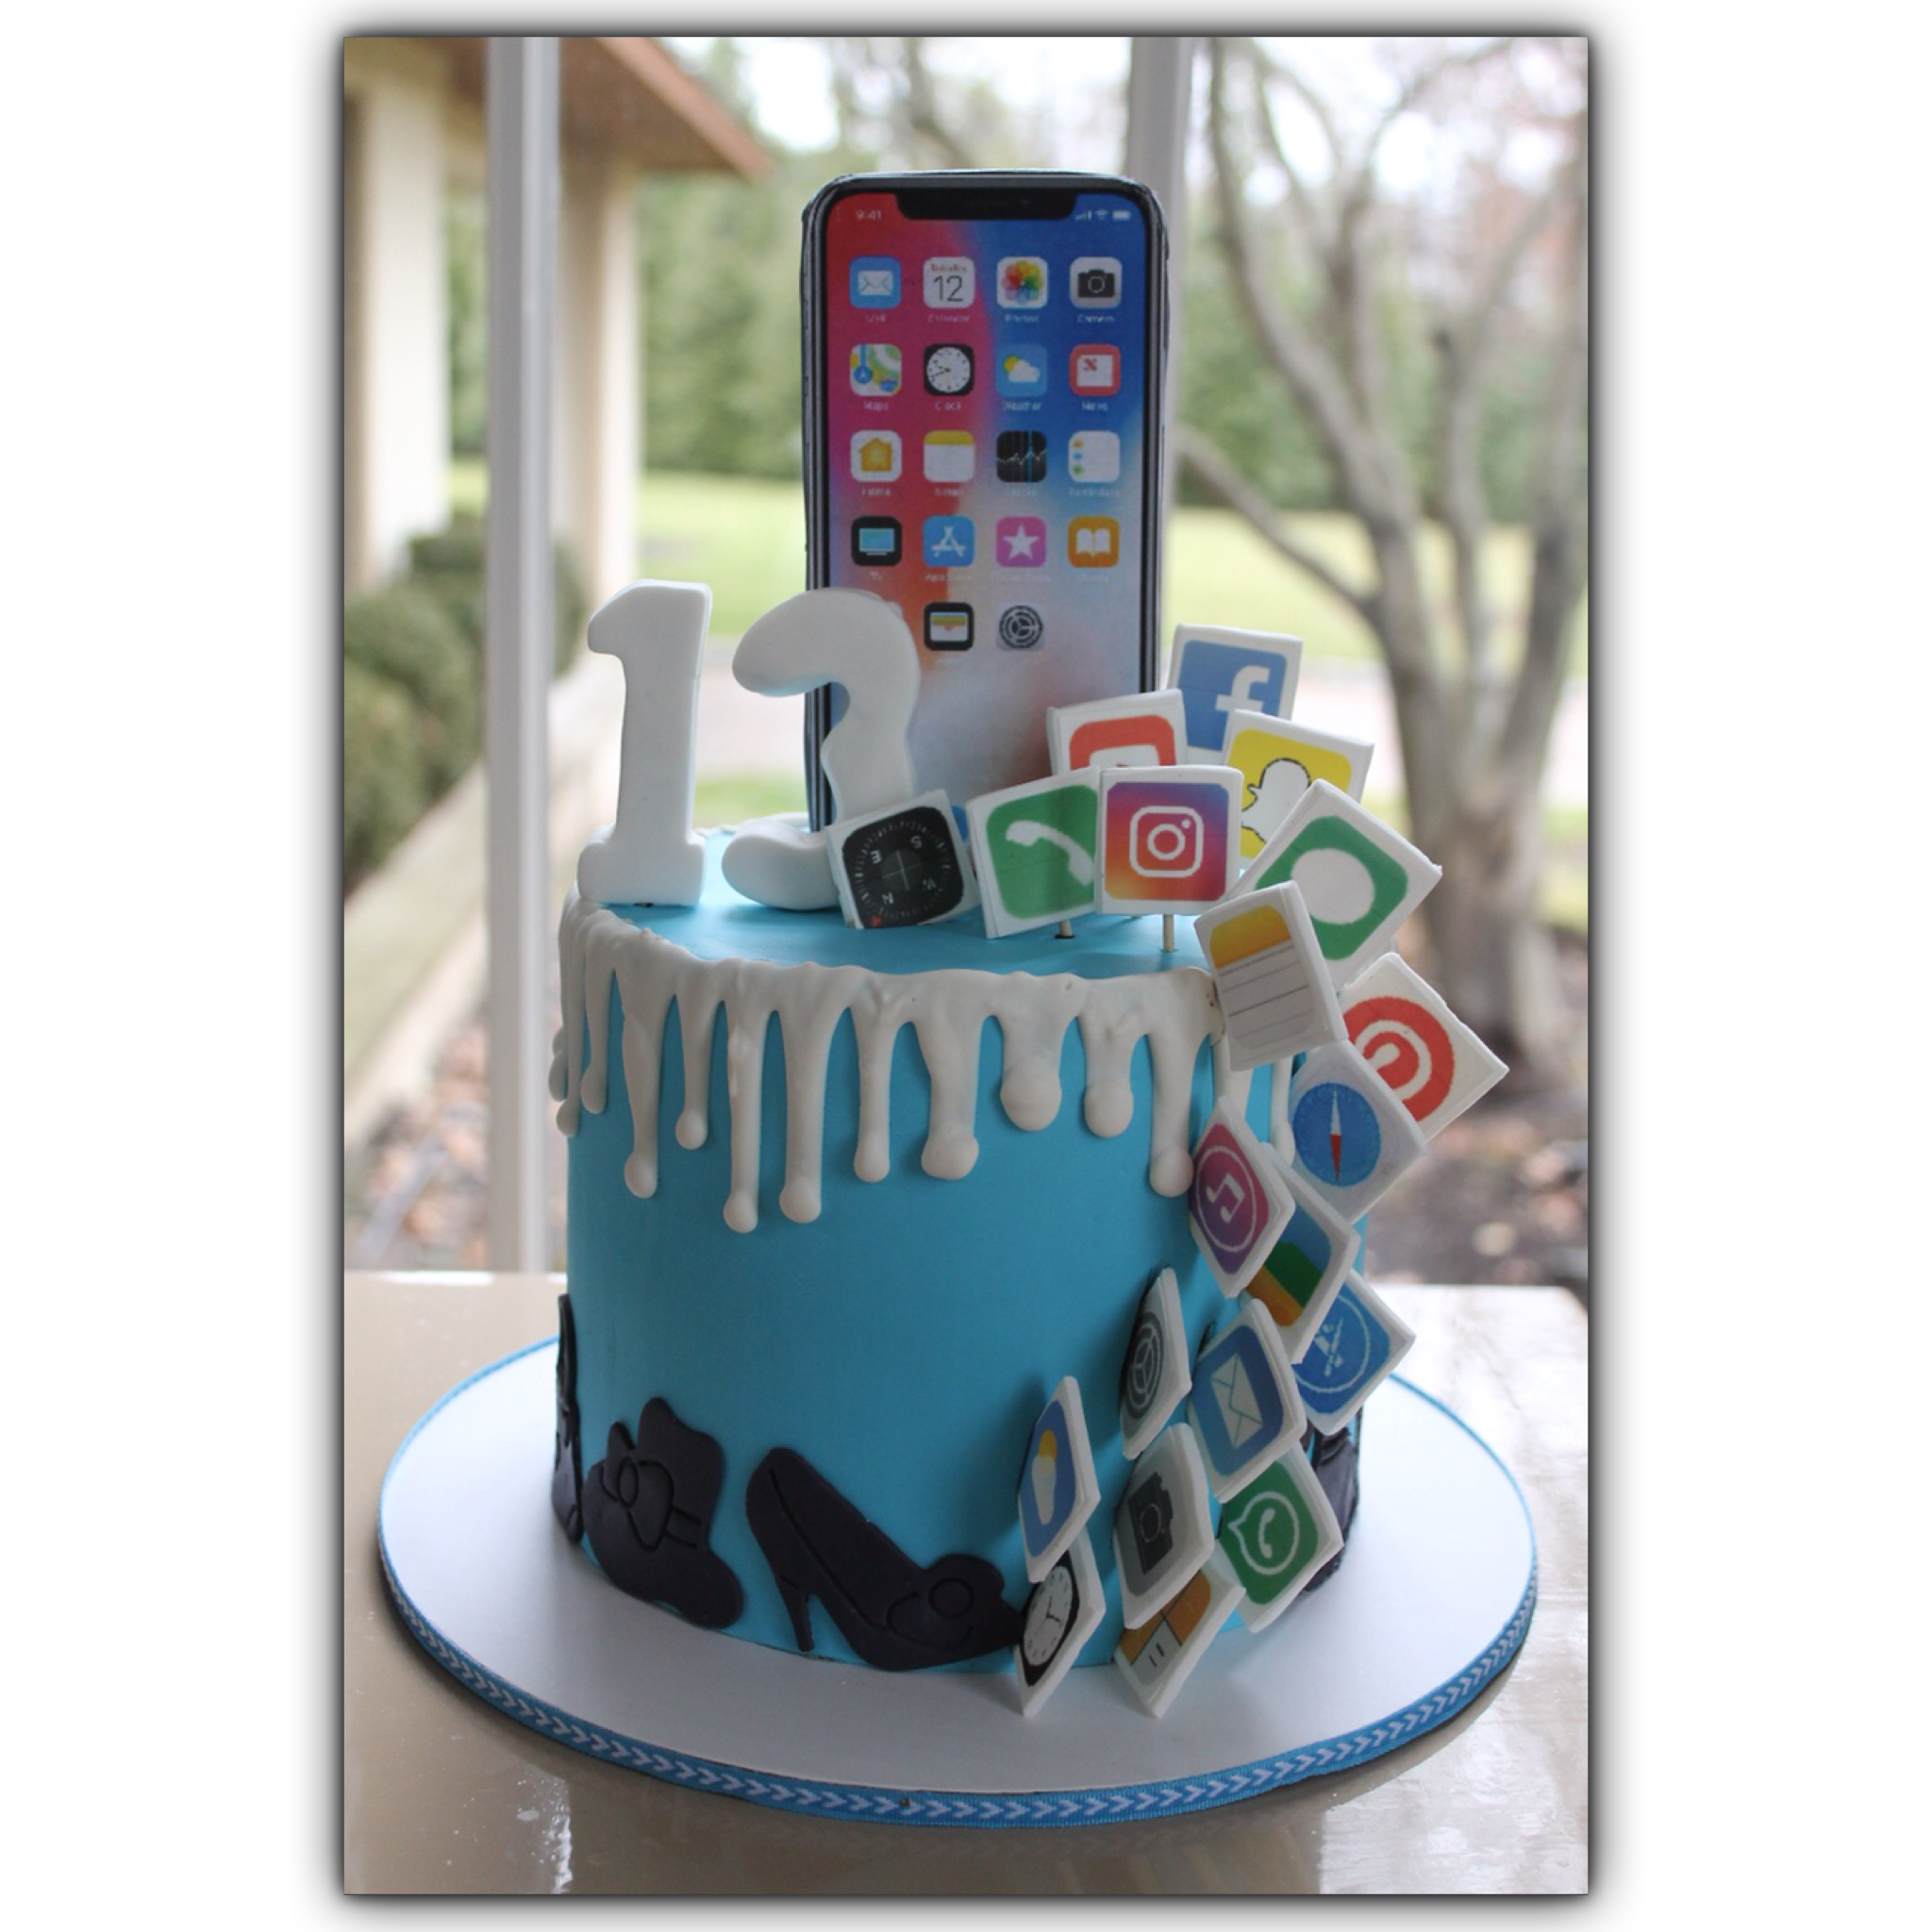 Marvelous Iphone Cake 13 Birthday Cake 14Th Birthday Cakes Boys 16Th Funny Birthday Cards Online Aeocydamsfinfo